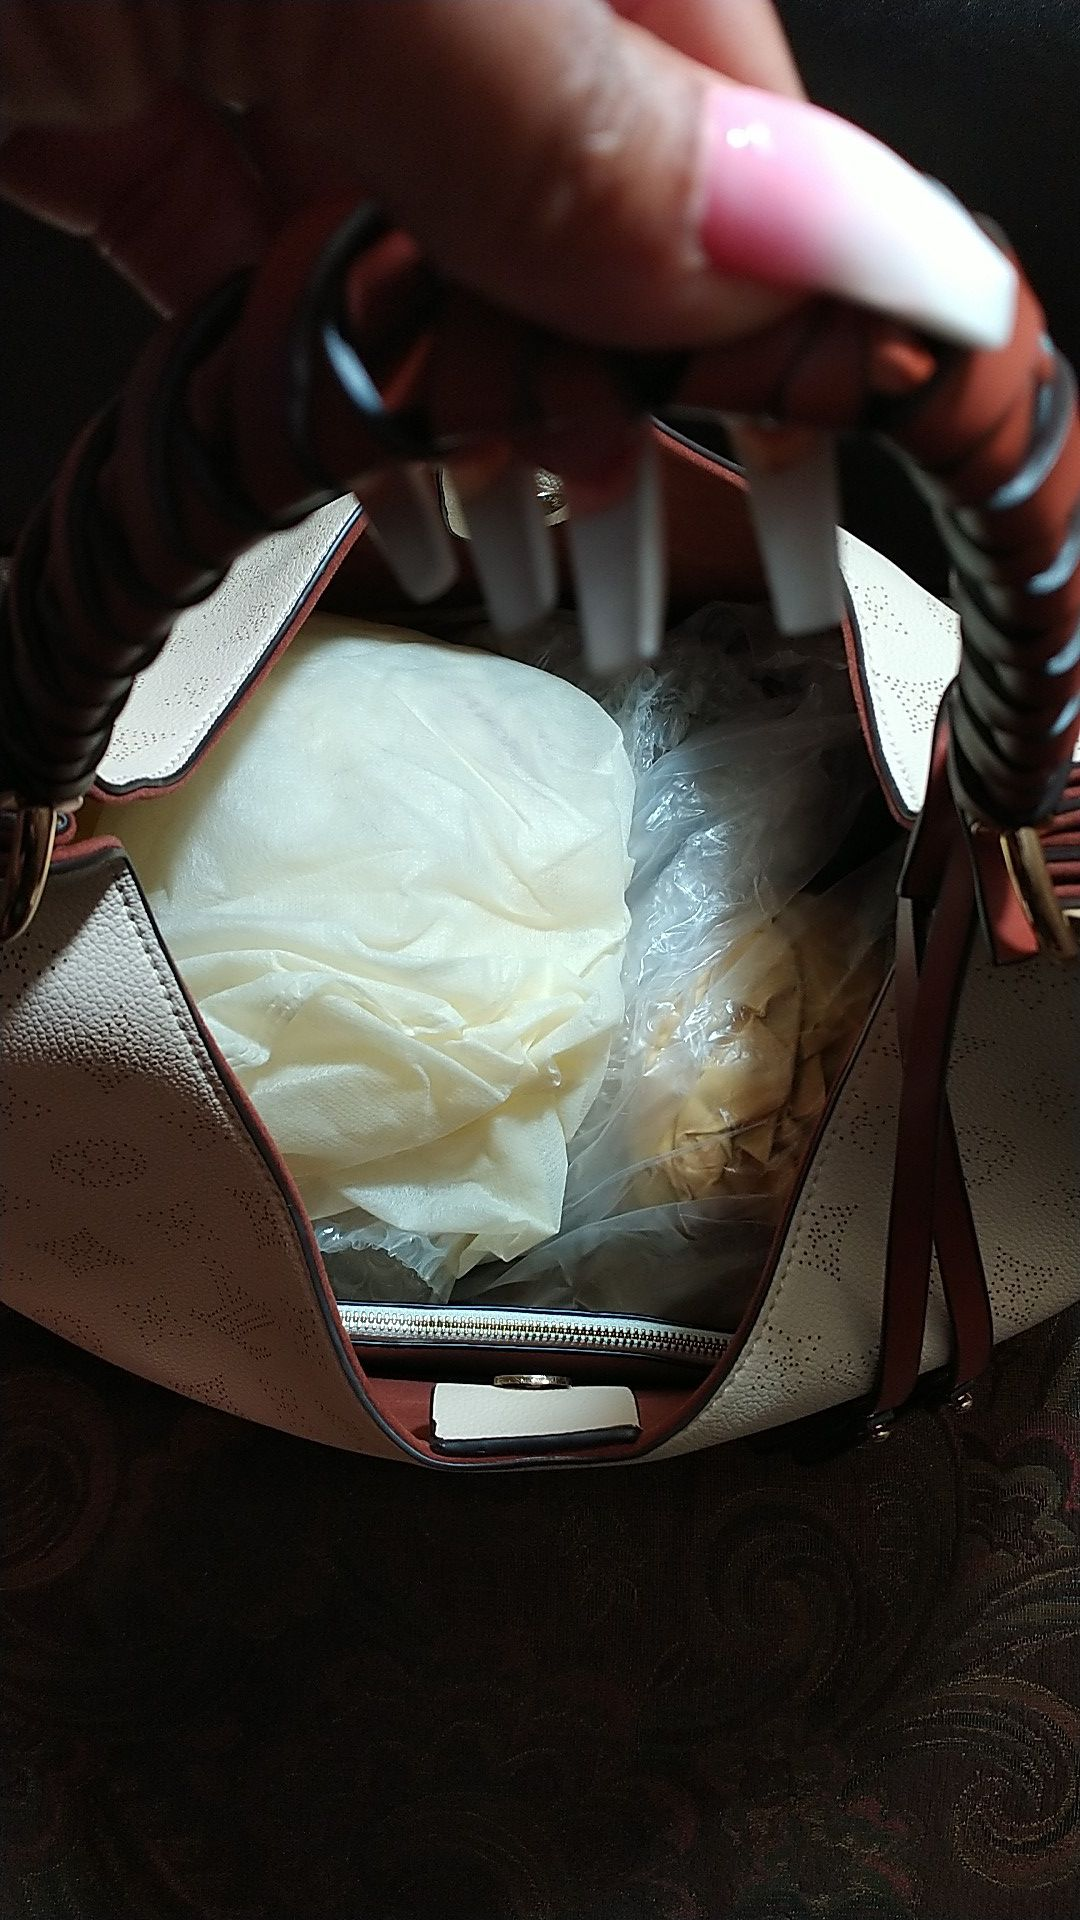 C😍A🤩R😍M😍E🤩L large purse beautiful 😍🤩😍